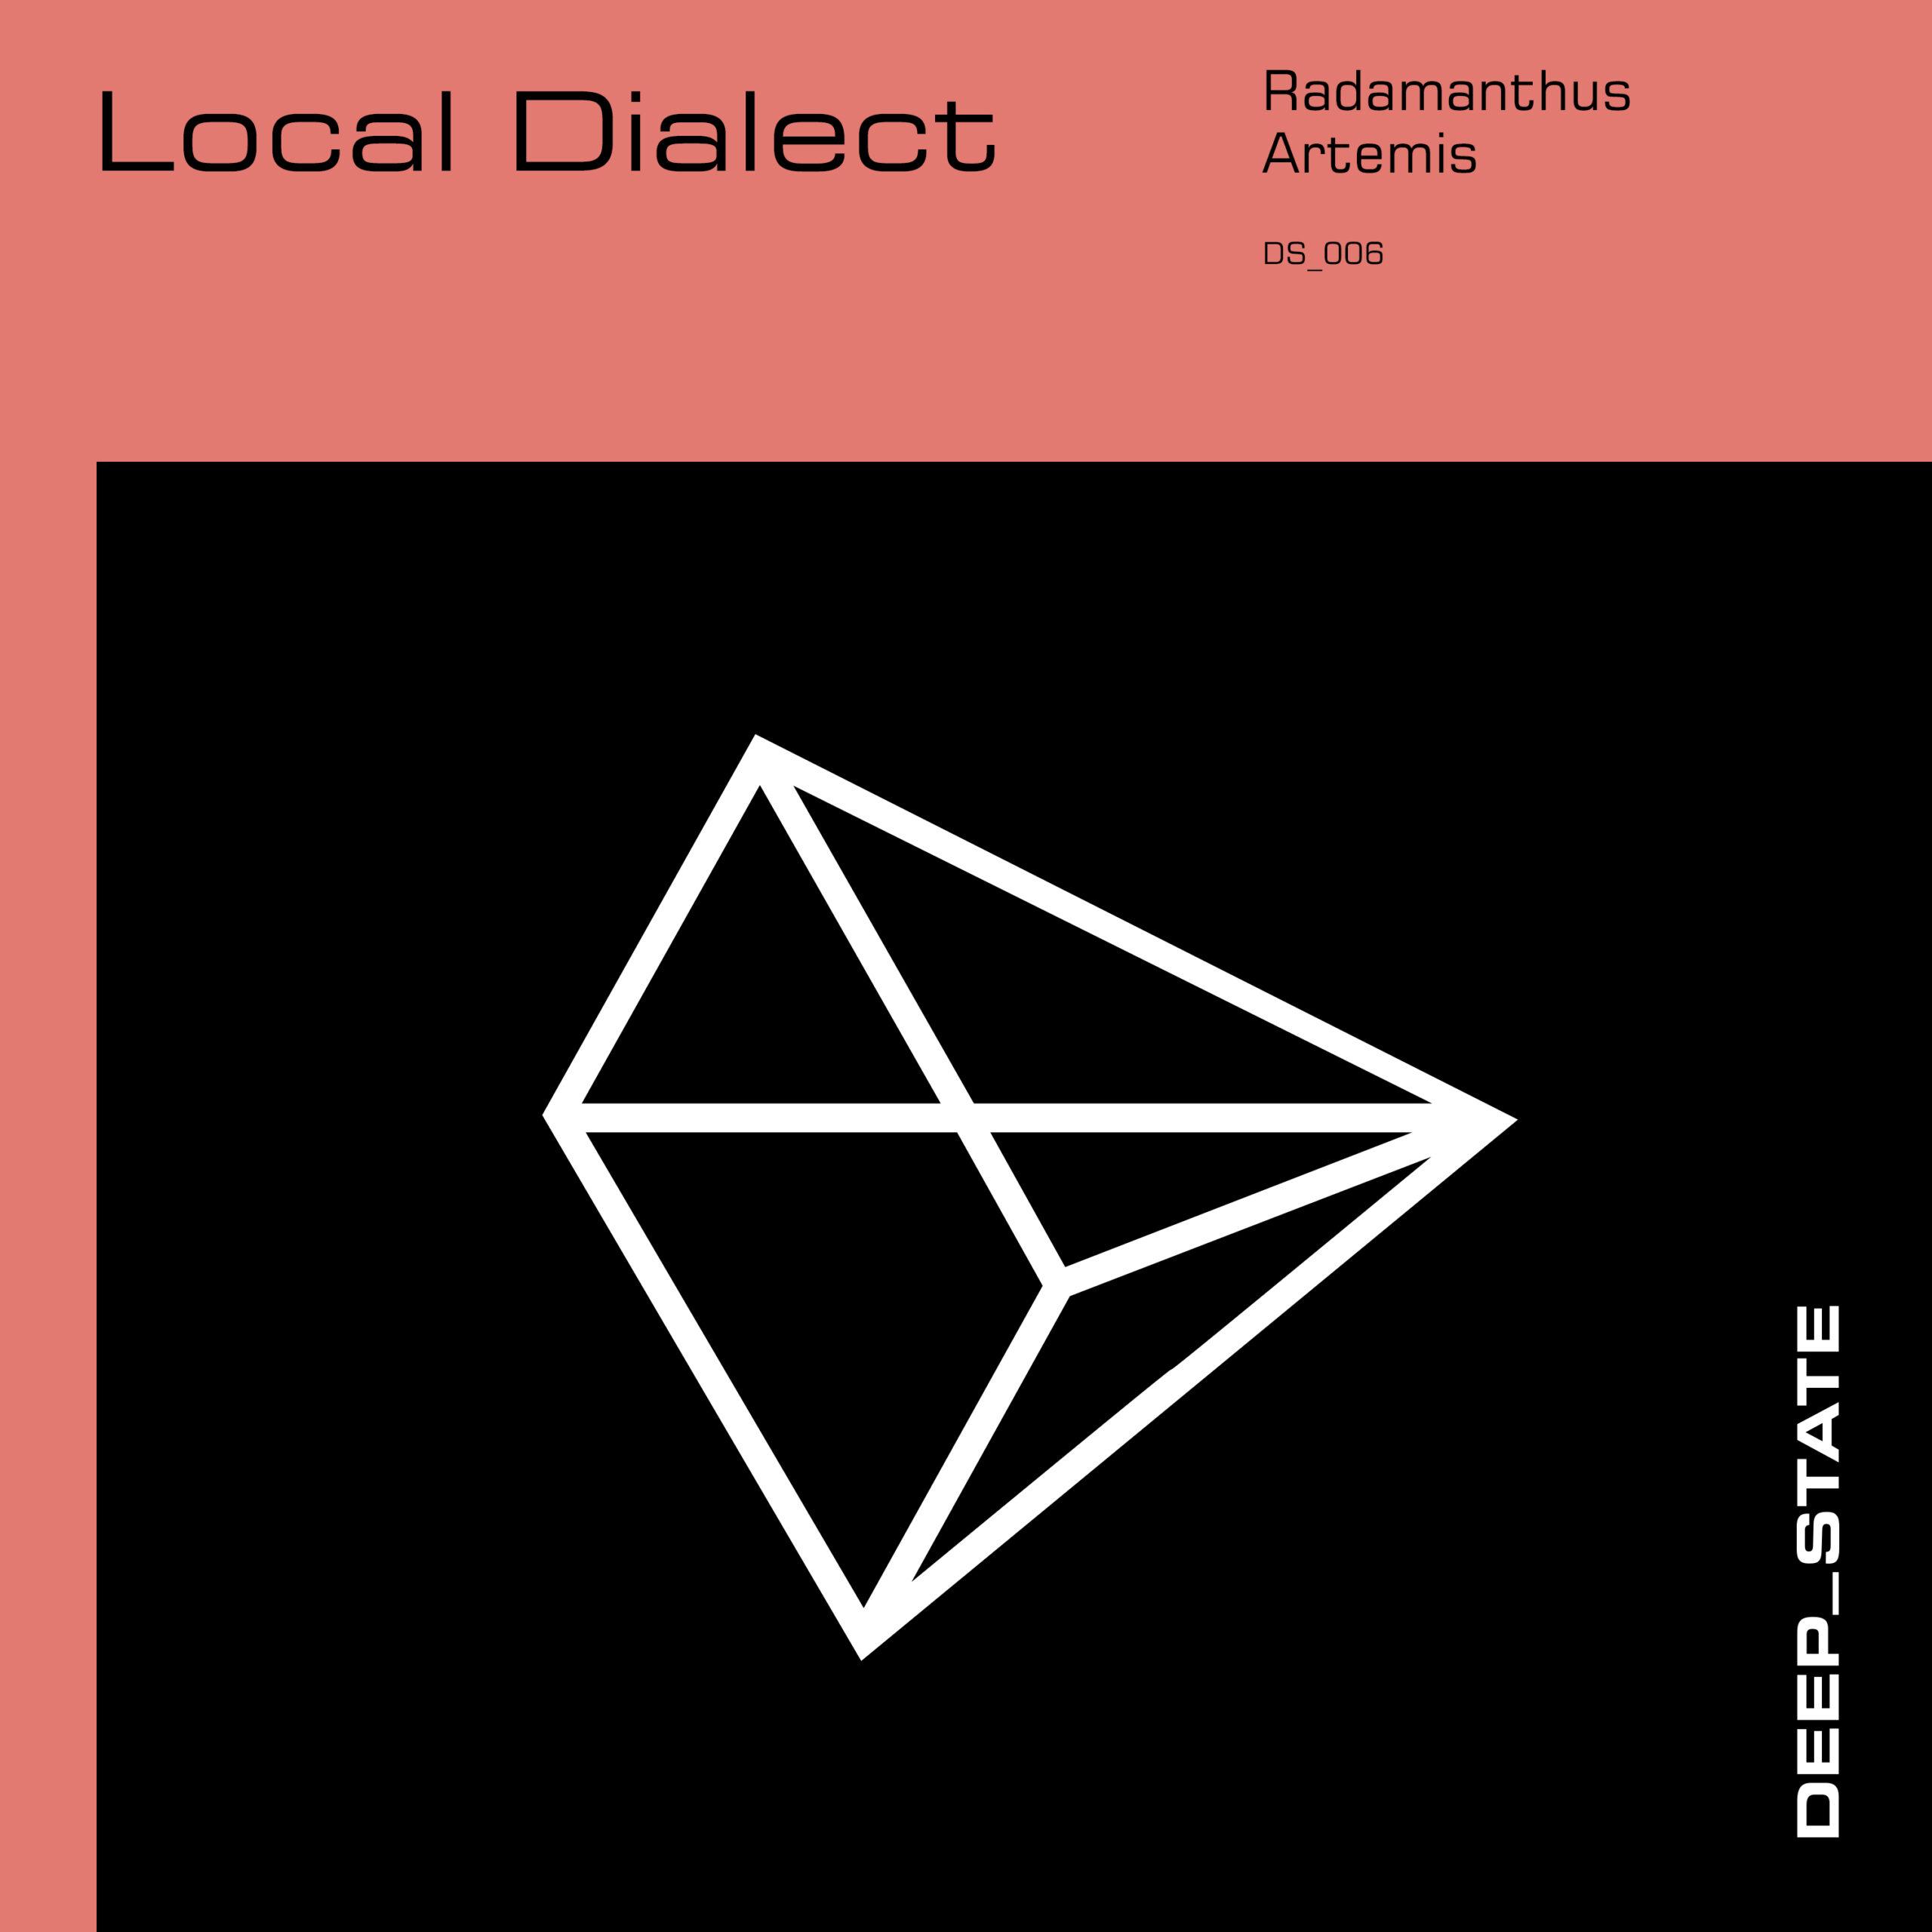 Local Dialect - Radamanthus/Artemis EP [Deep State]